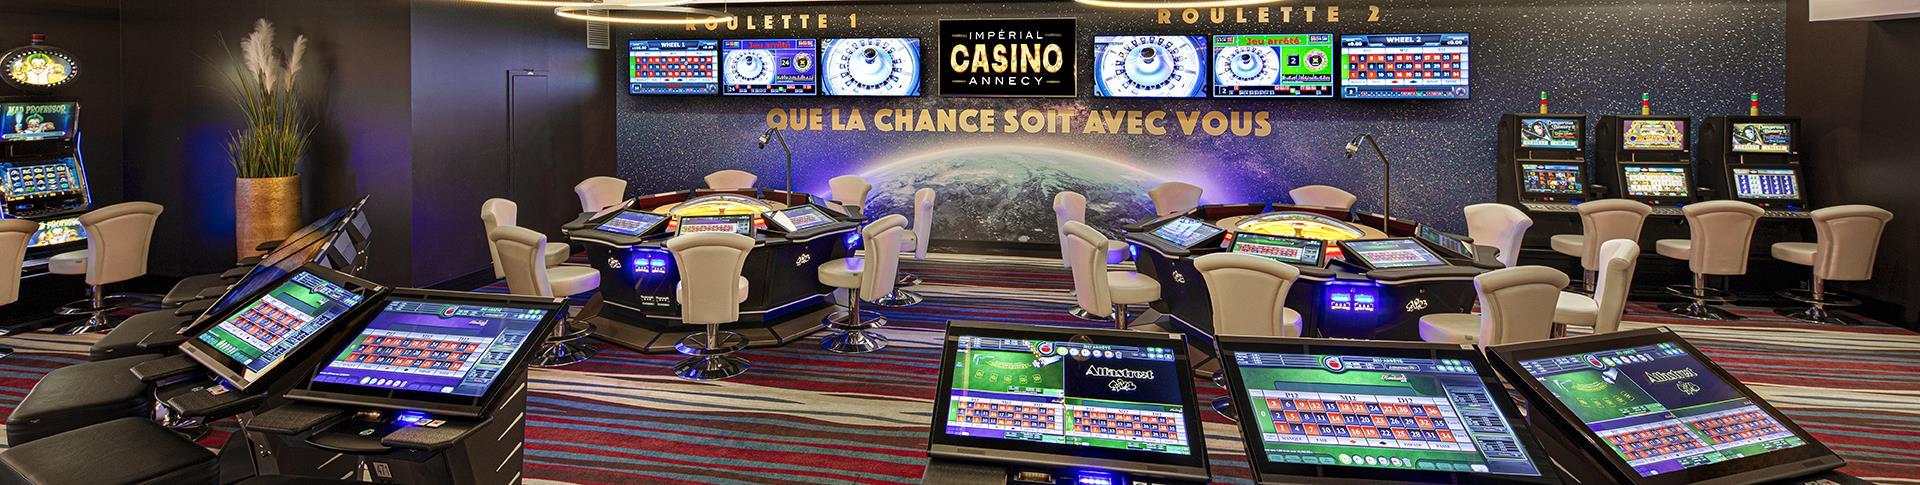 Roulette Room du Casino Impérial Annecy